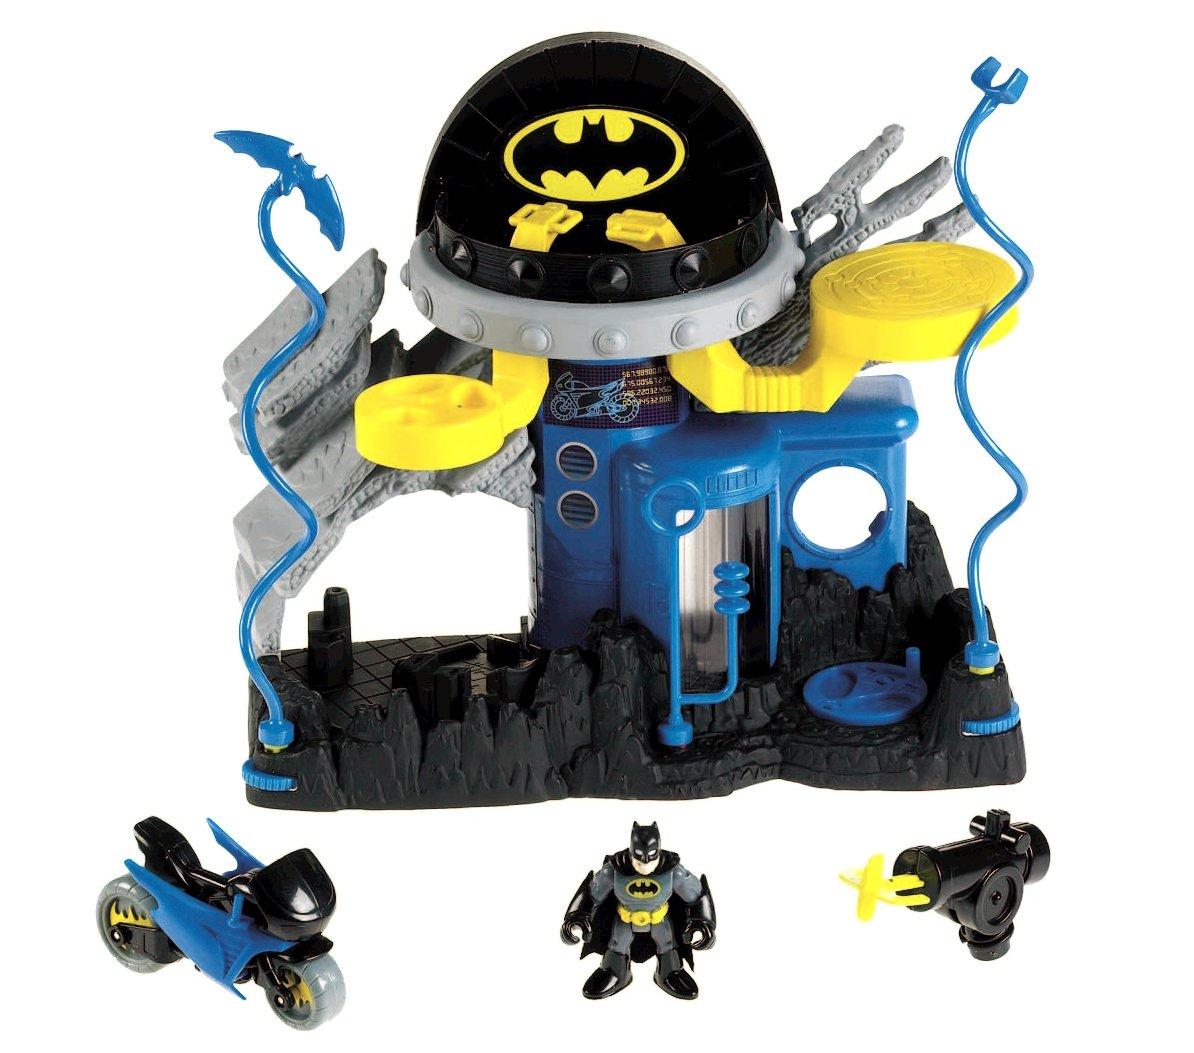 Fisher-Preis Imaginext Super Friends Bat Bat Bat Command Center e0171f